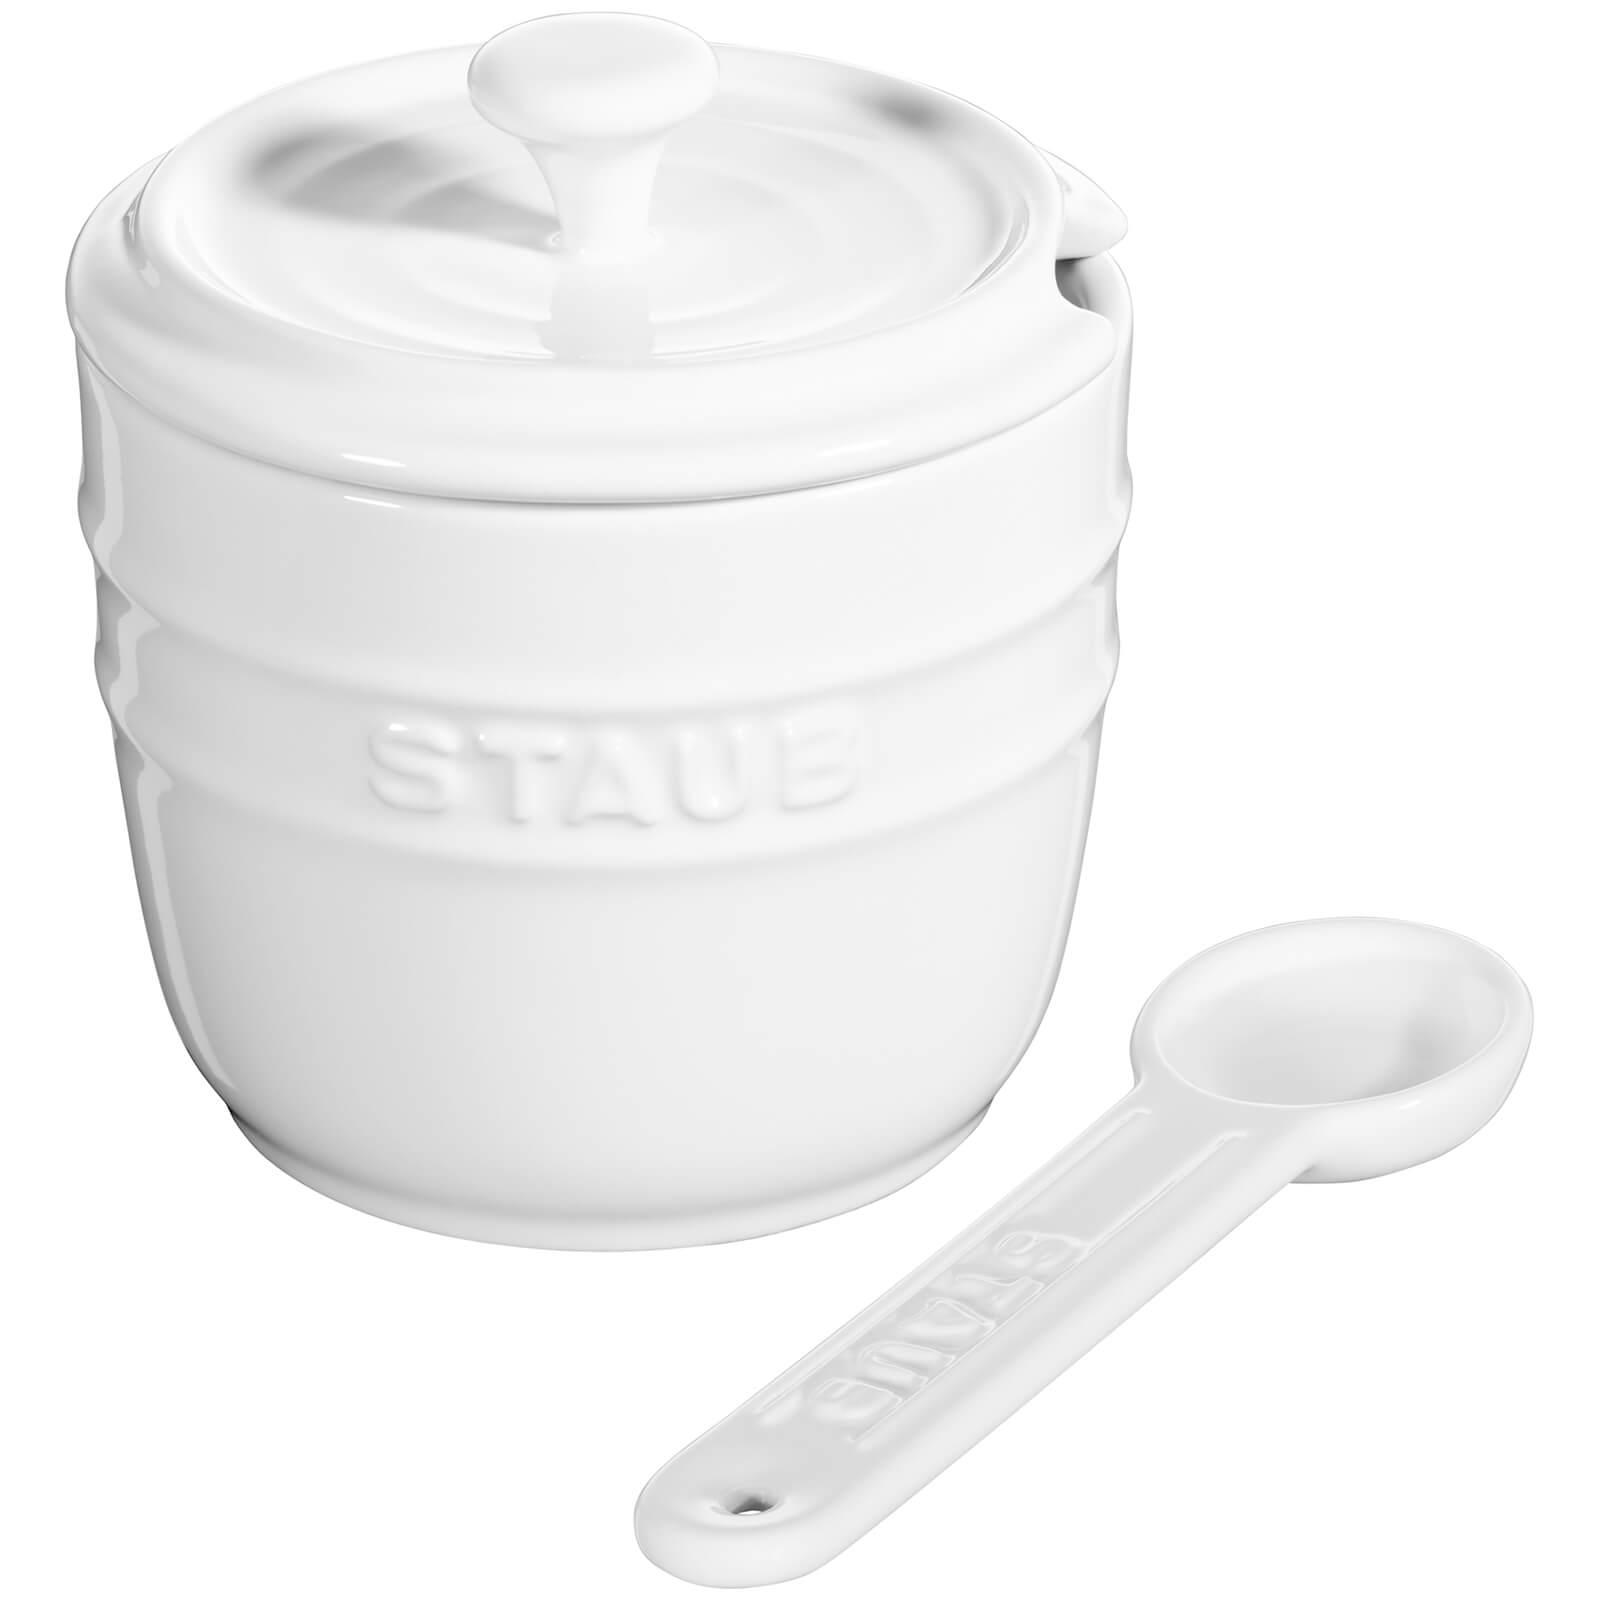 Staub Ceramic Round Sugar Bowl - White